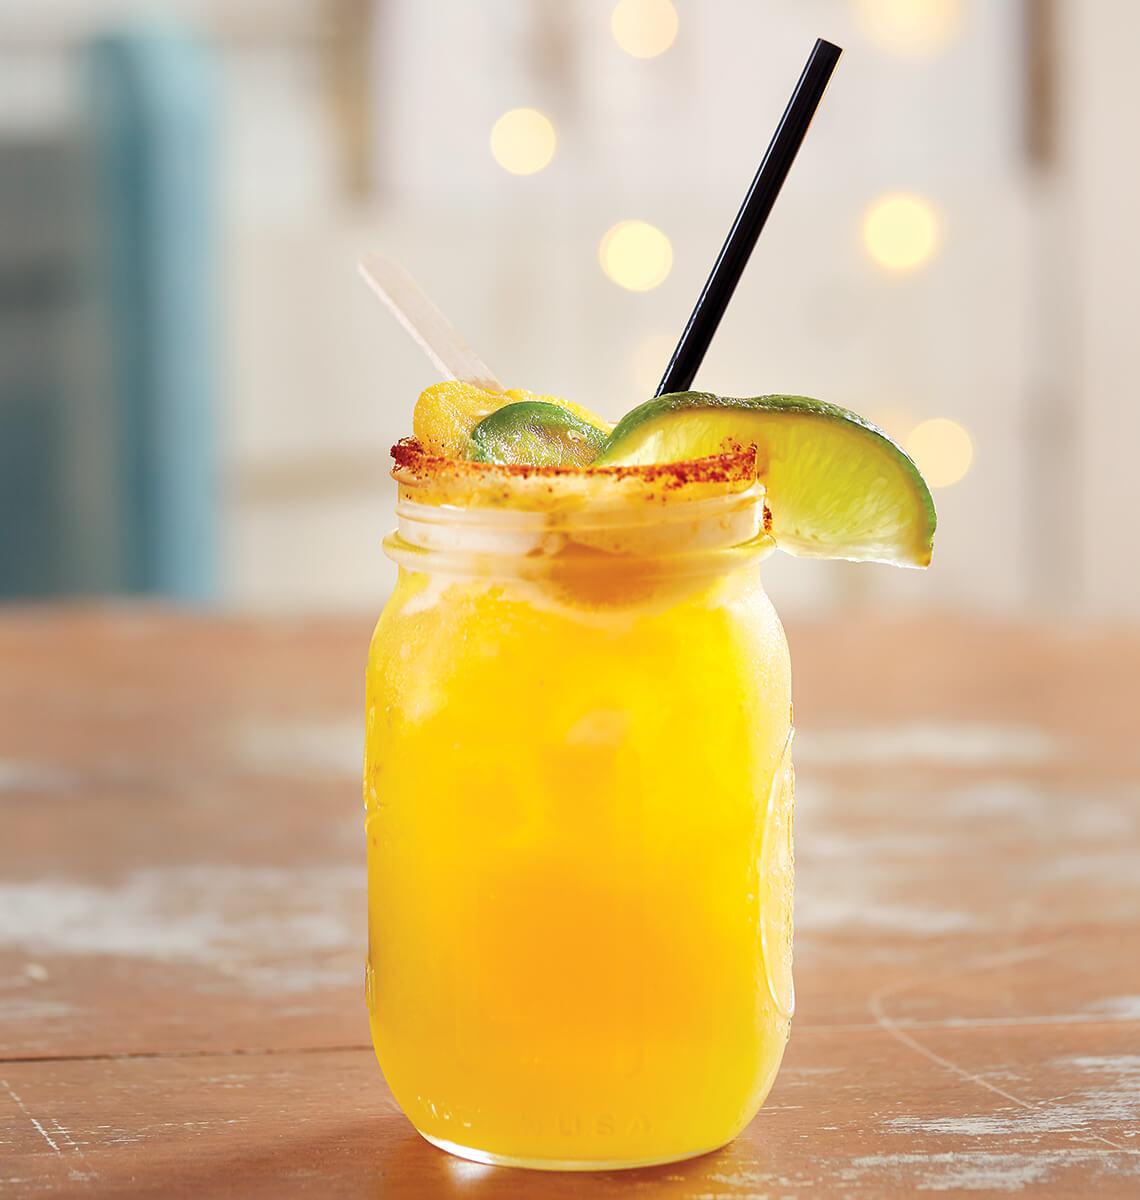 Fancy cocktail in a mason jar with fruit garnish.